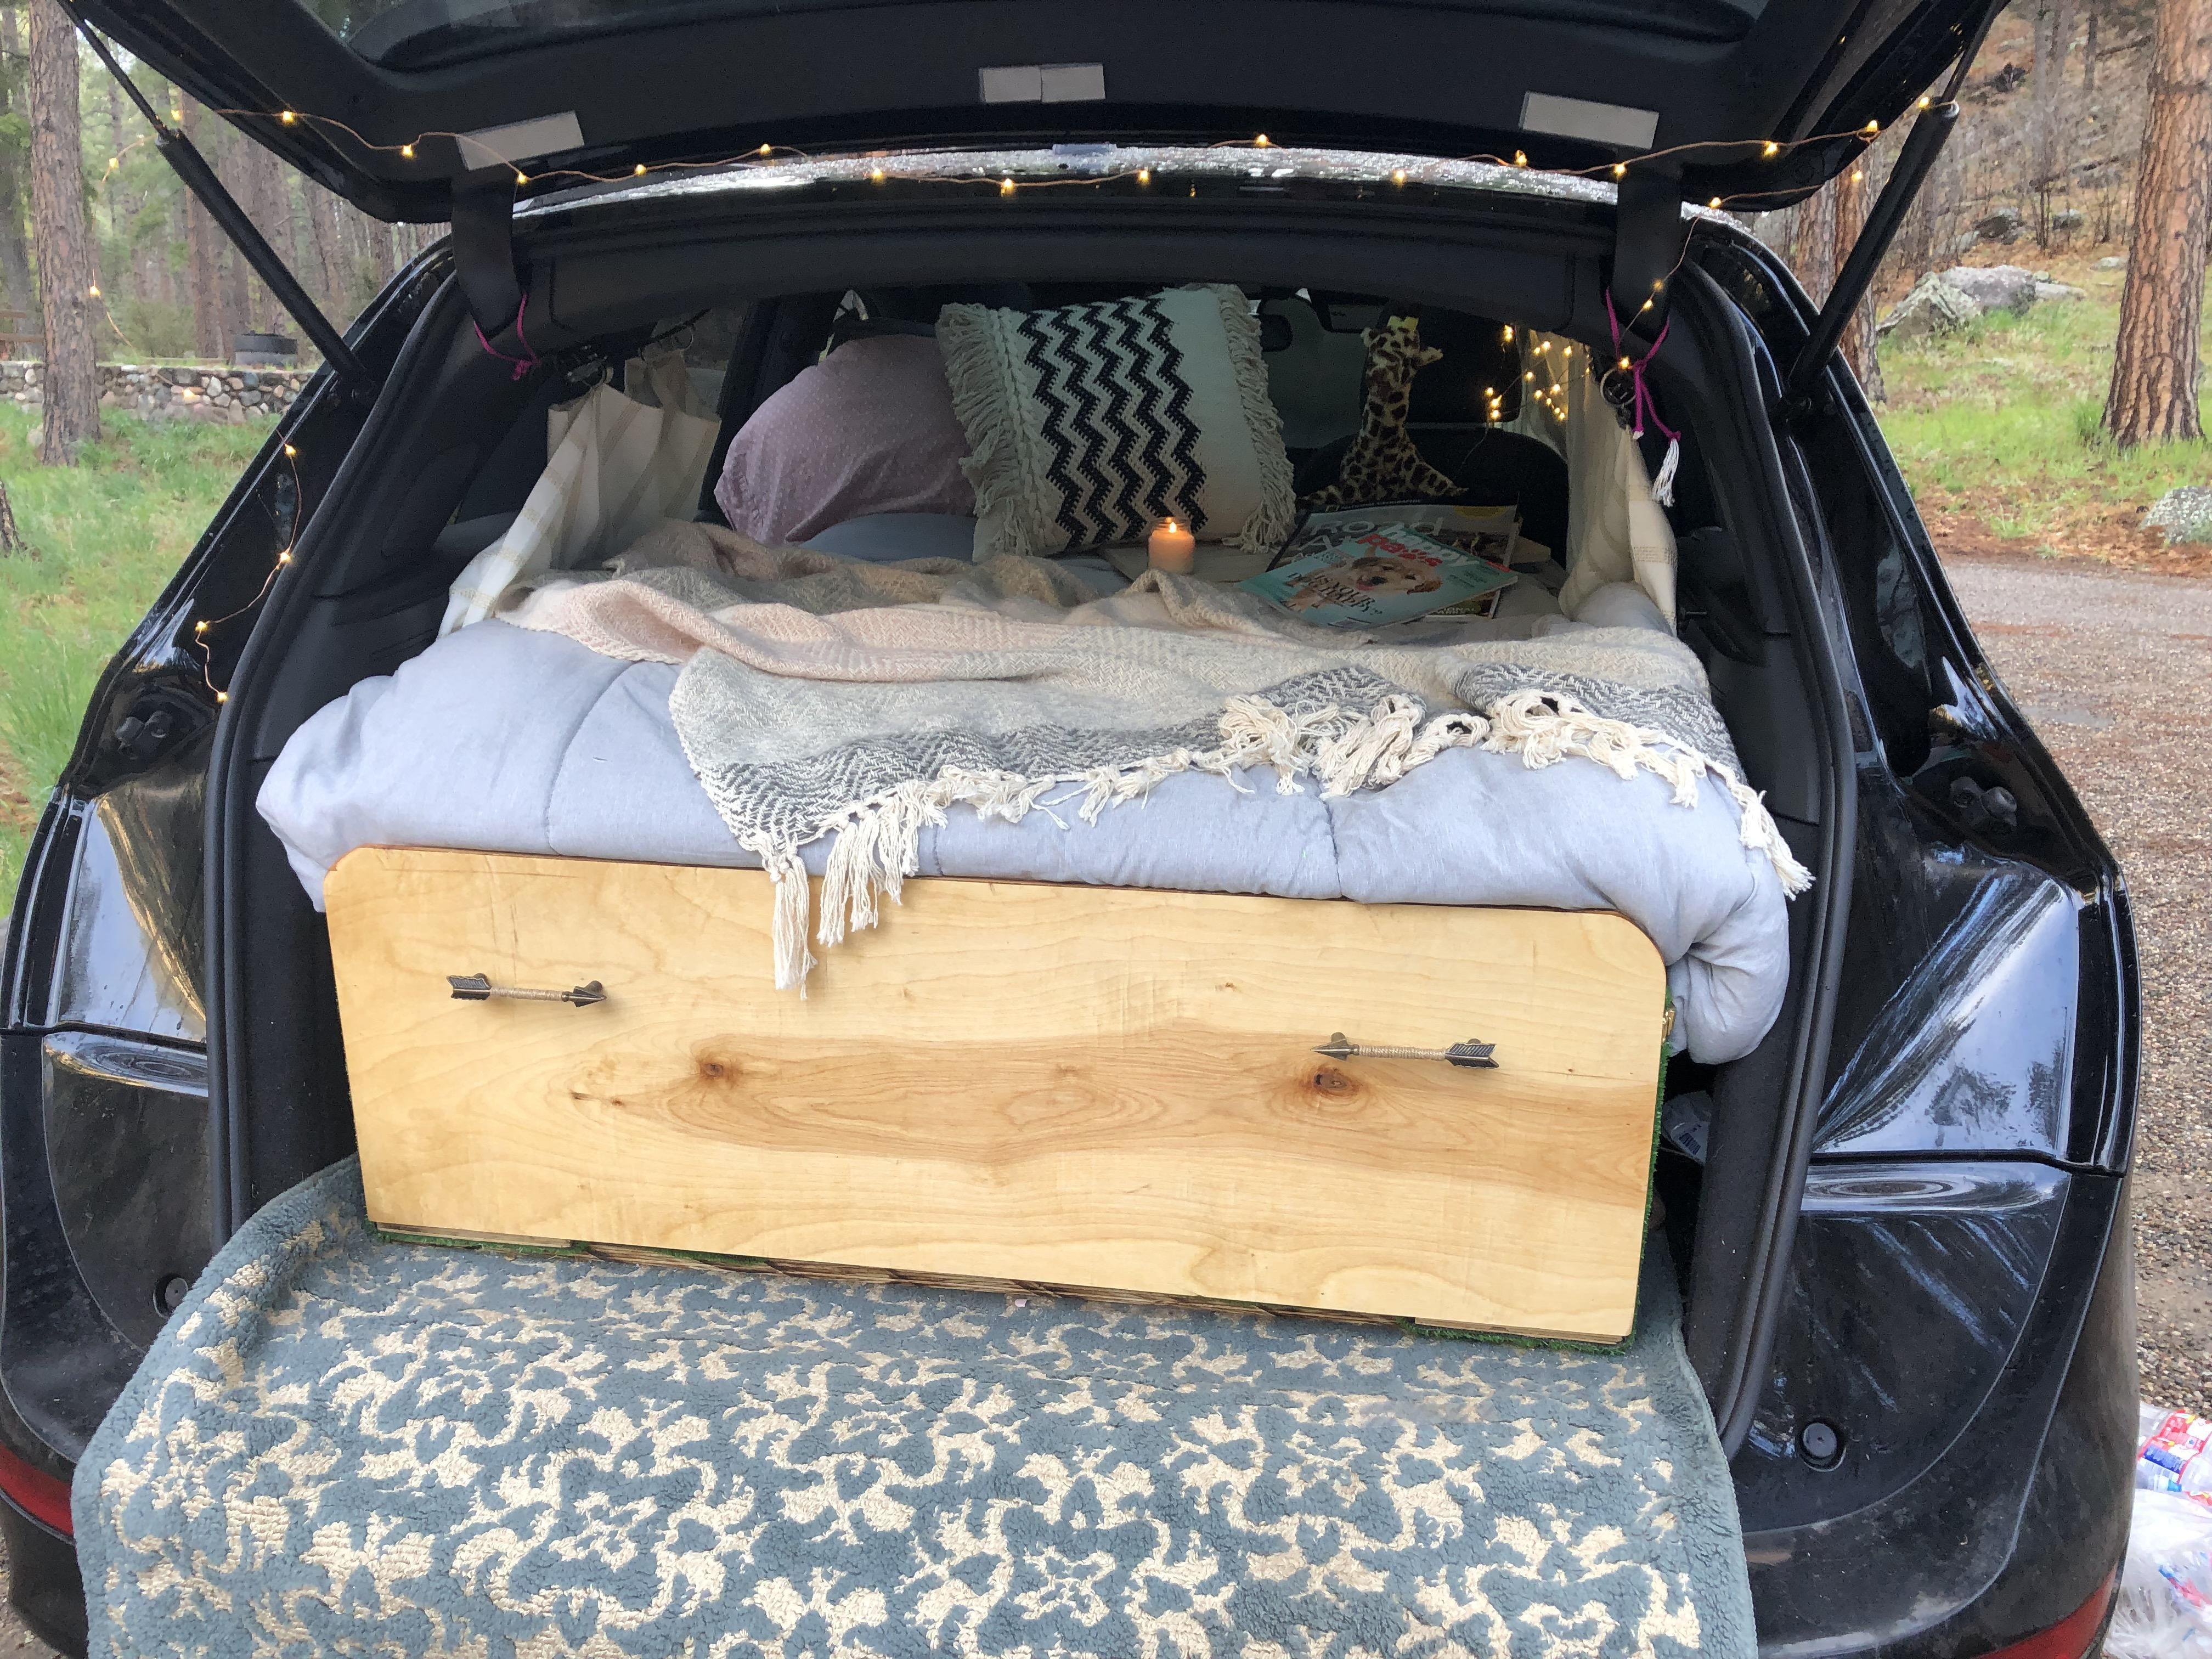 Converted My Audi Q5 Into A Camper Van For A Southwest Road Trip Camping Hiking Outdoors Tent Outdoor Caravan Campsite Audi Q5 Best Camping Gear Camper